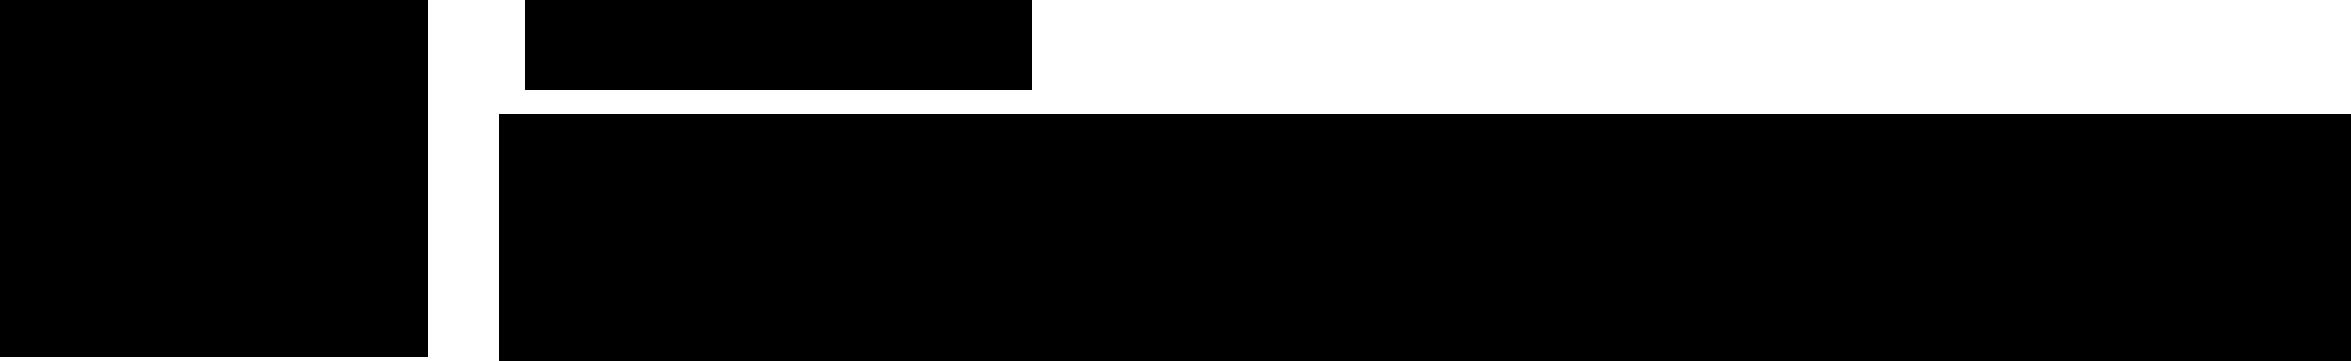 Gruppo Giamundo S.r.l